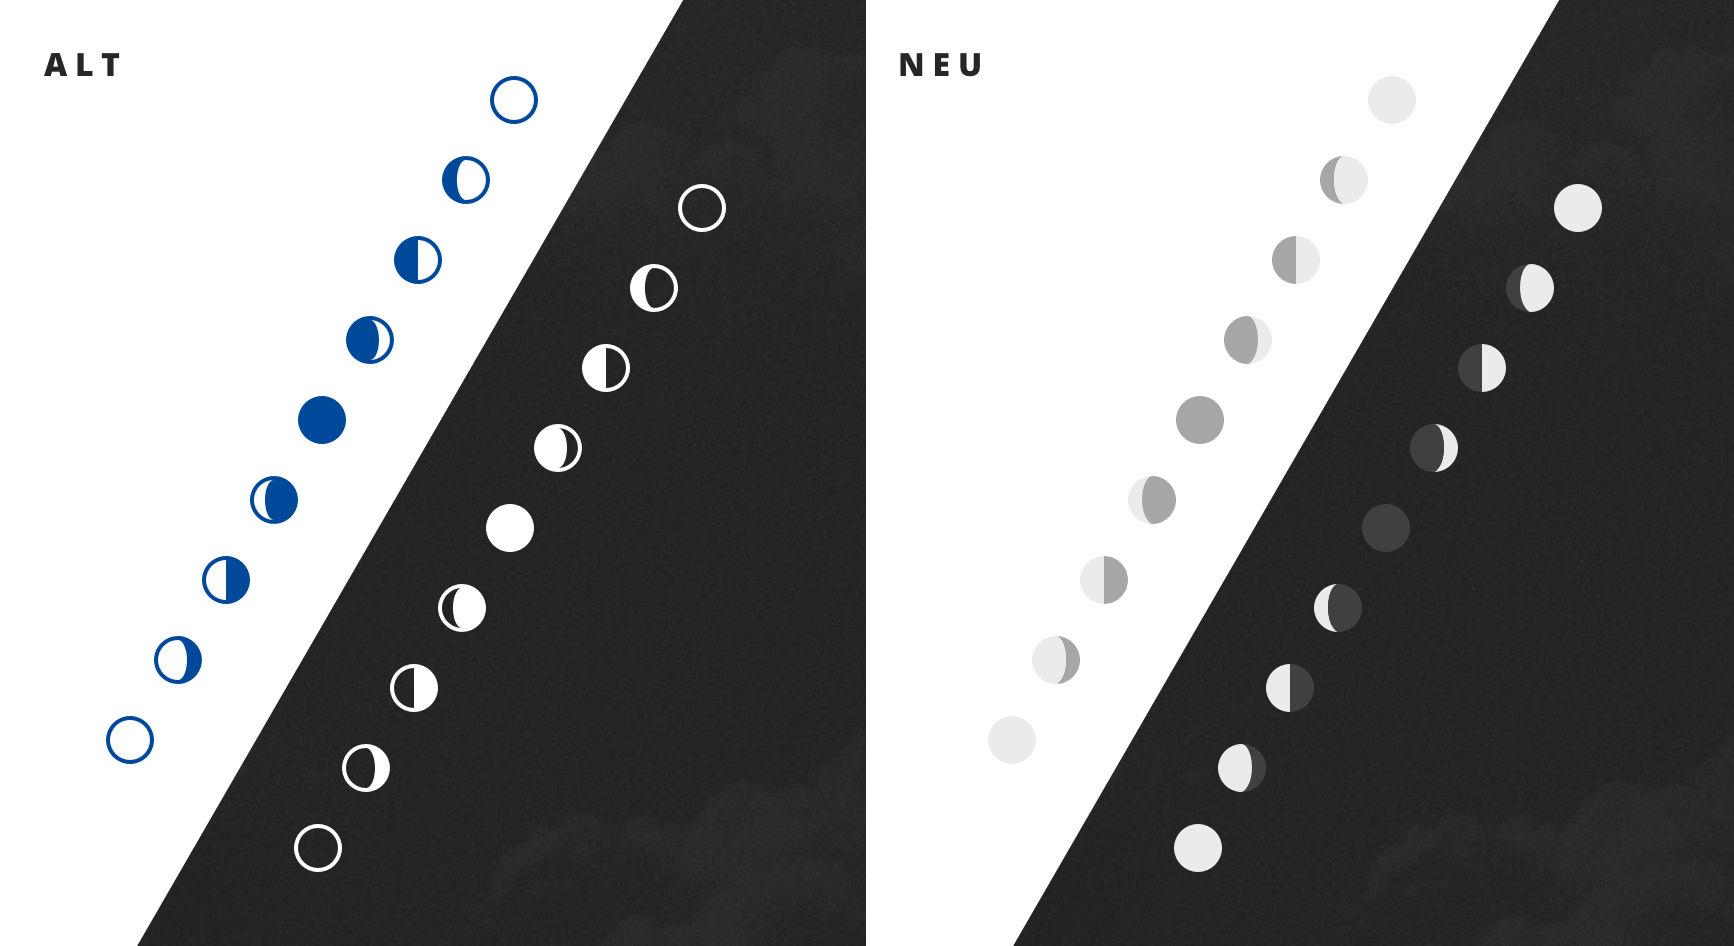 wetter.com dark mode design - icons